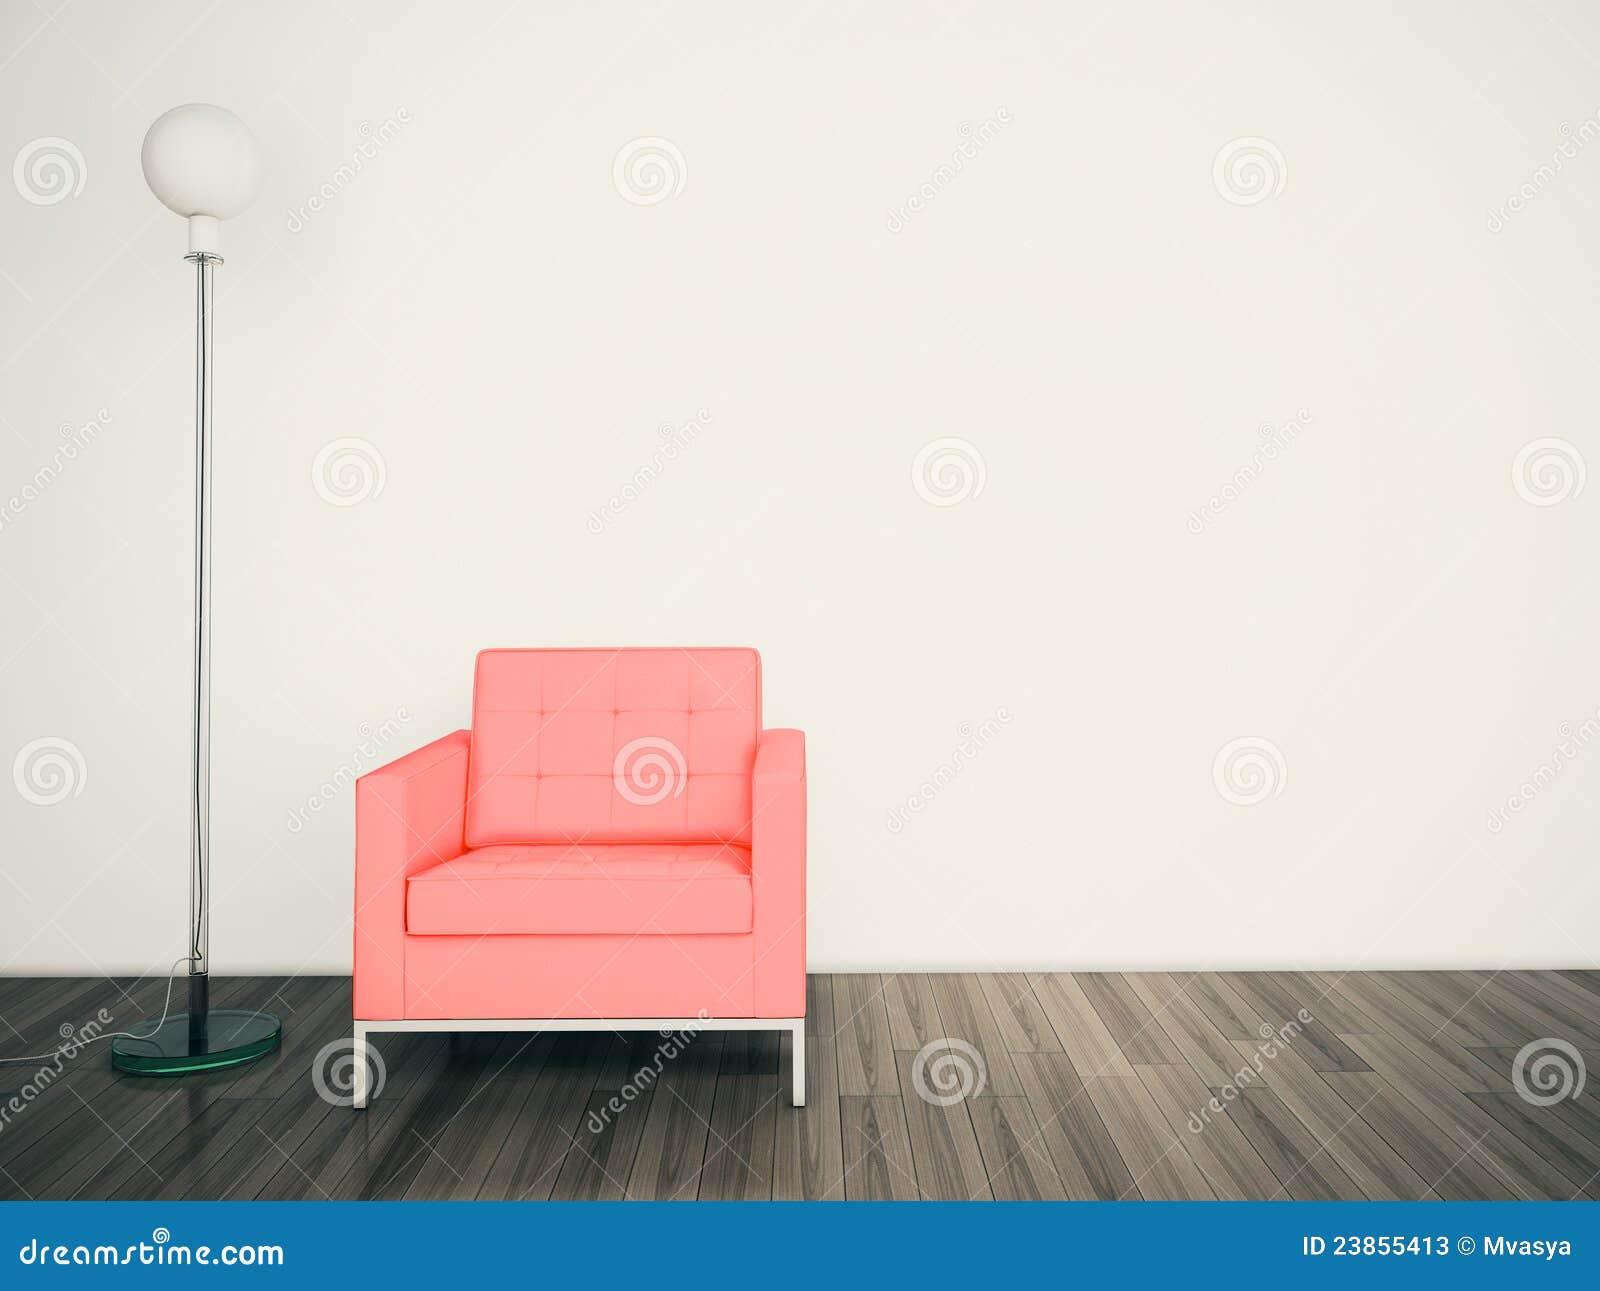 Minimal Modern Interior Armchair FACE A BLANK WALL Stock Photos - Image: 23855413